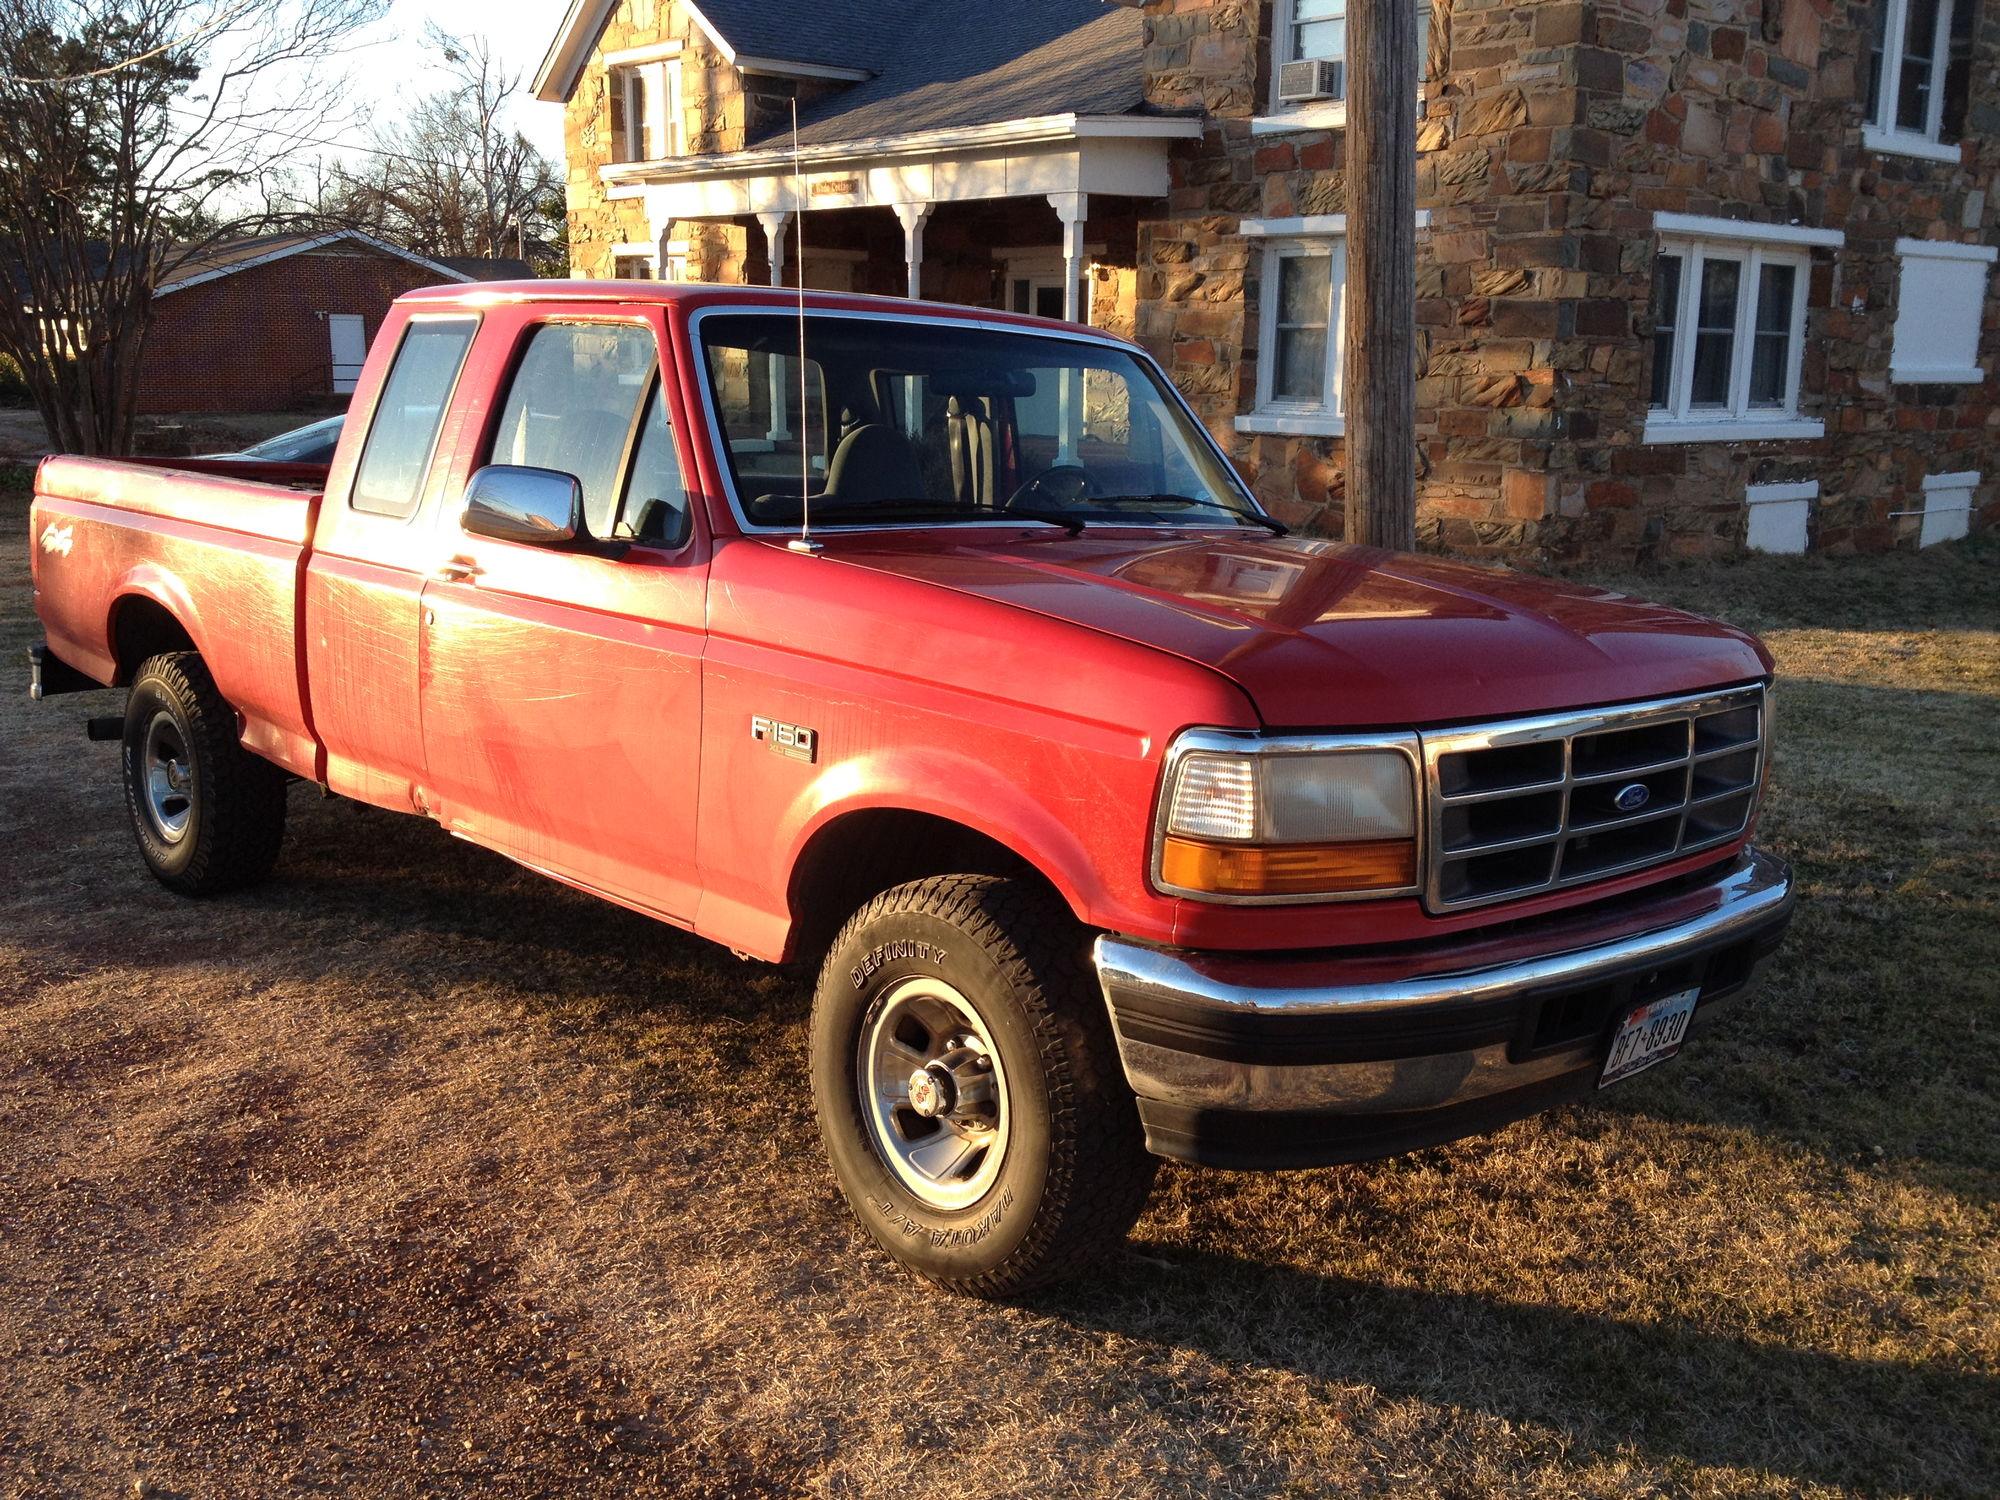 red rocket build 39 96 f150 4x4 ford f150 forum community of ford truck fans. Black Bedroom Furniture Sets. Home Design Ideas